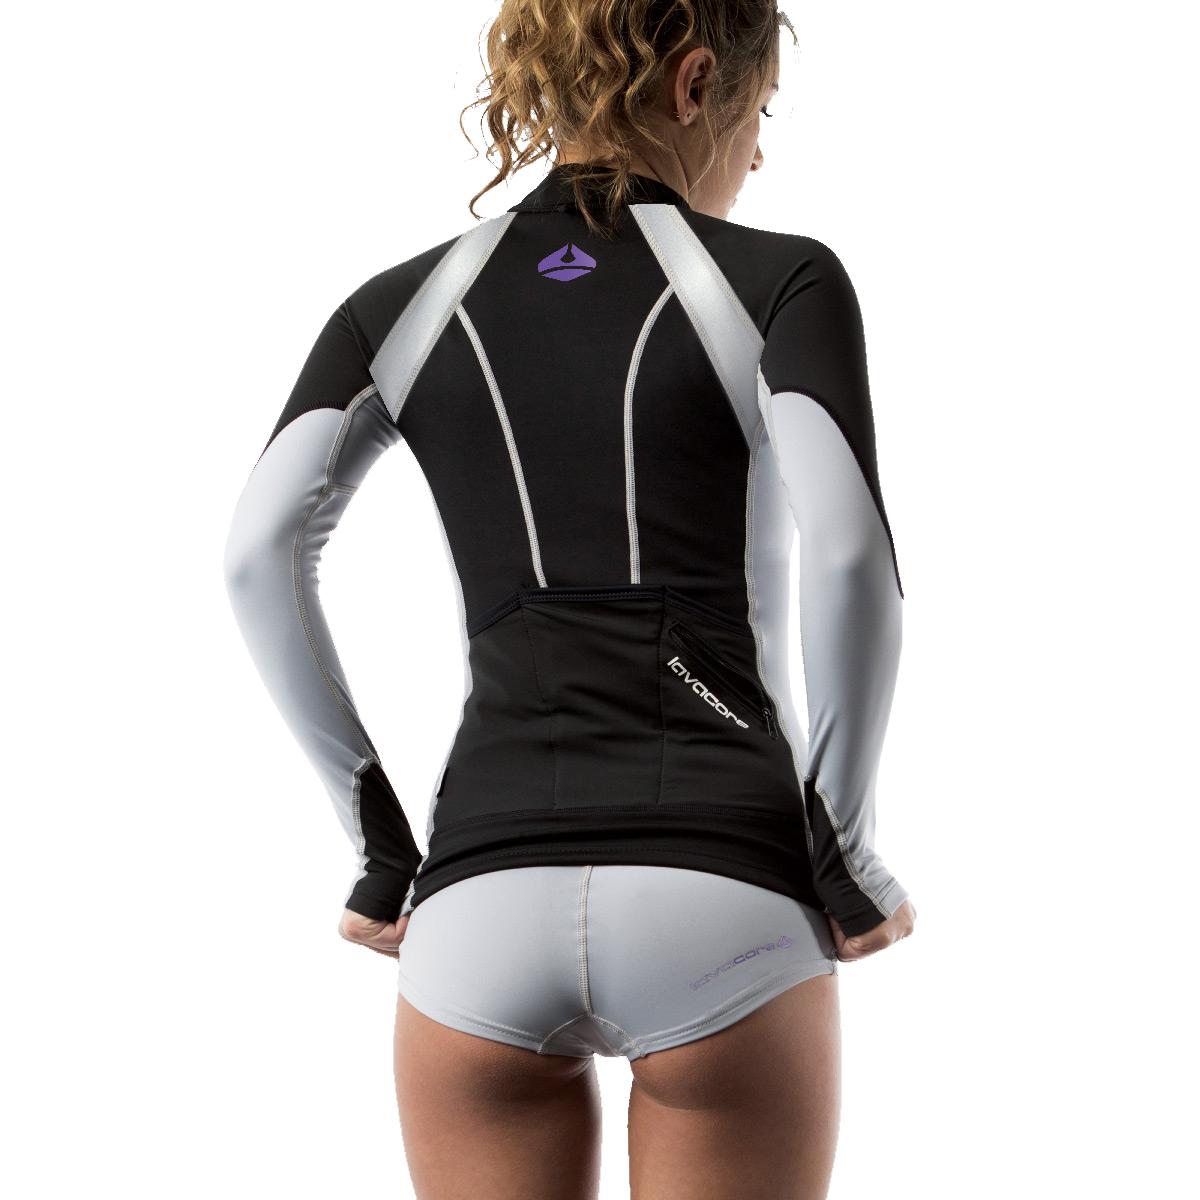 EliteSUPJacket_women_back3.jpg